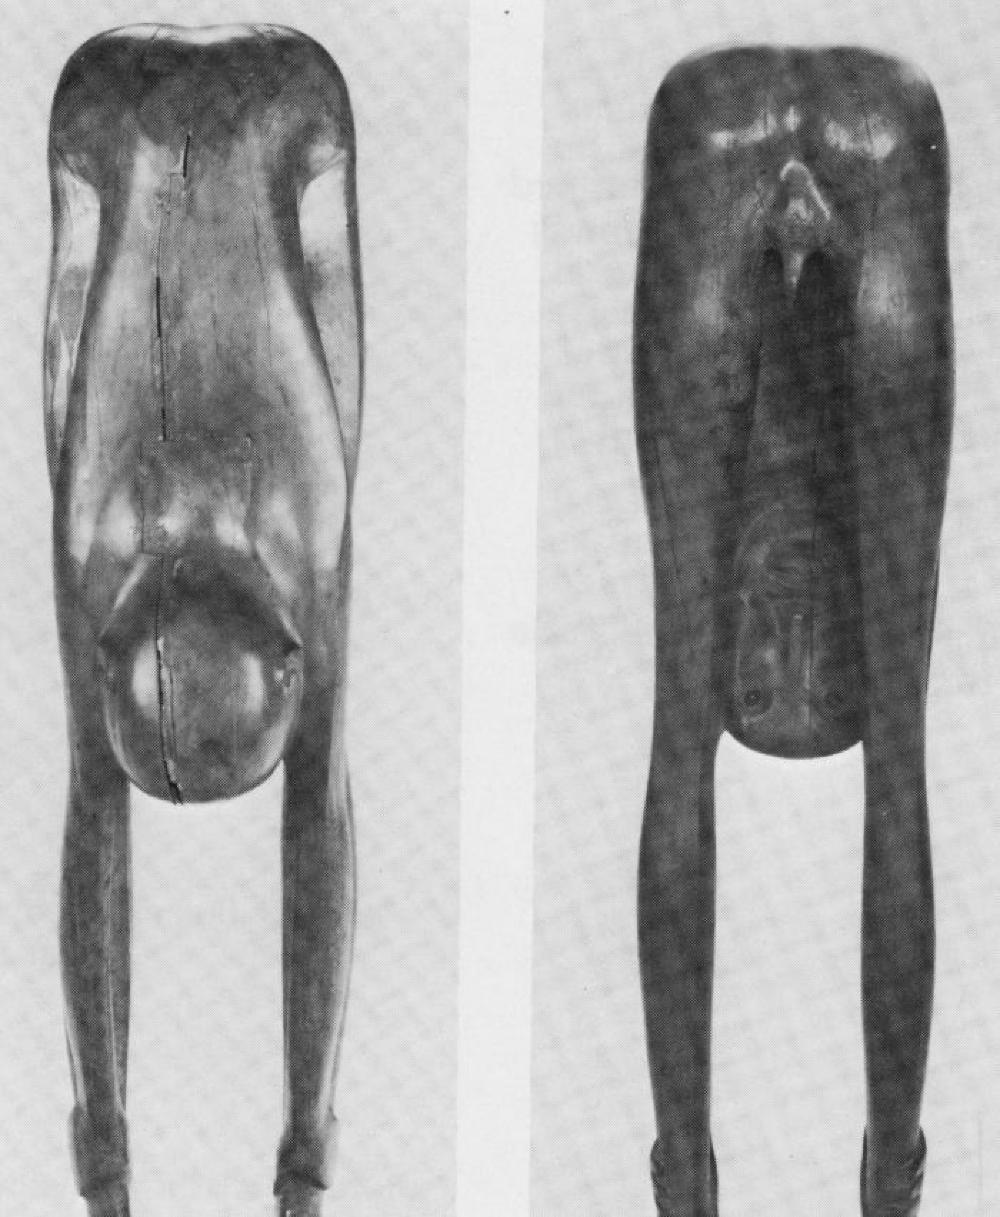 Boy Looking through Legs, image 2